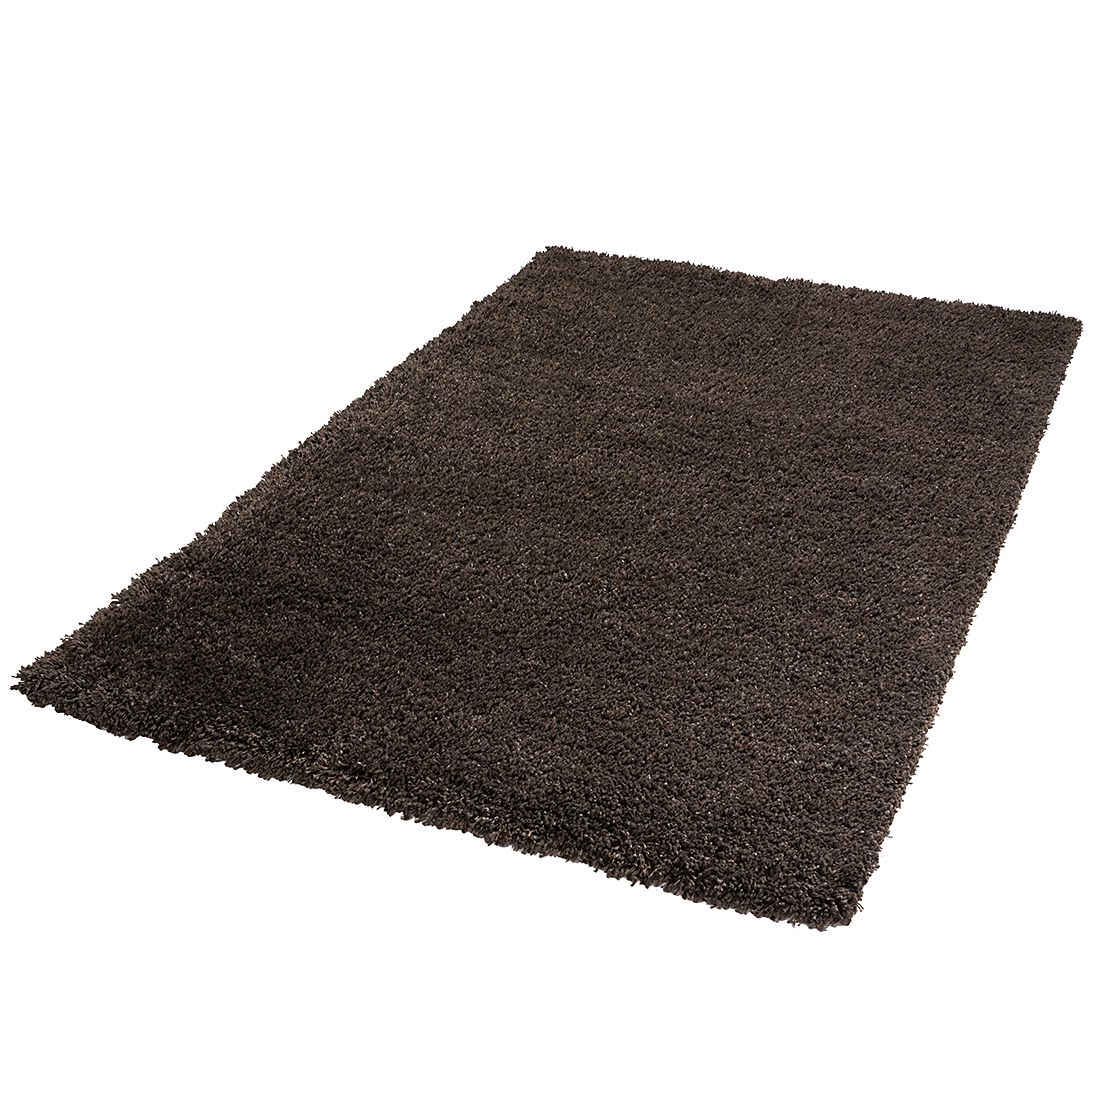 Teppich Lima – Schokoladenbraun – 80 x 150 cm, DEKOWE jetzt bestellen